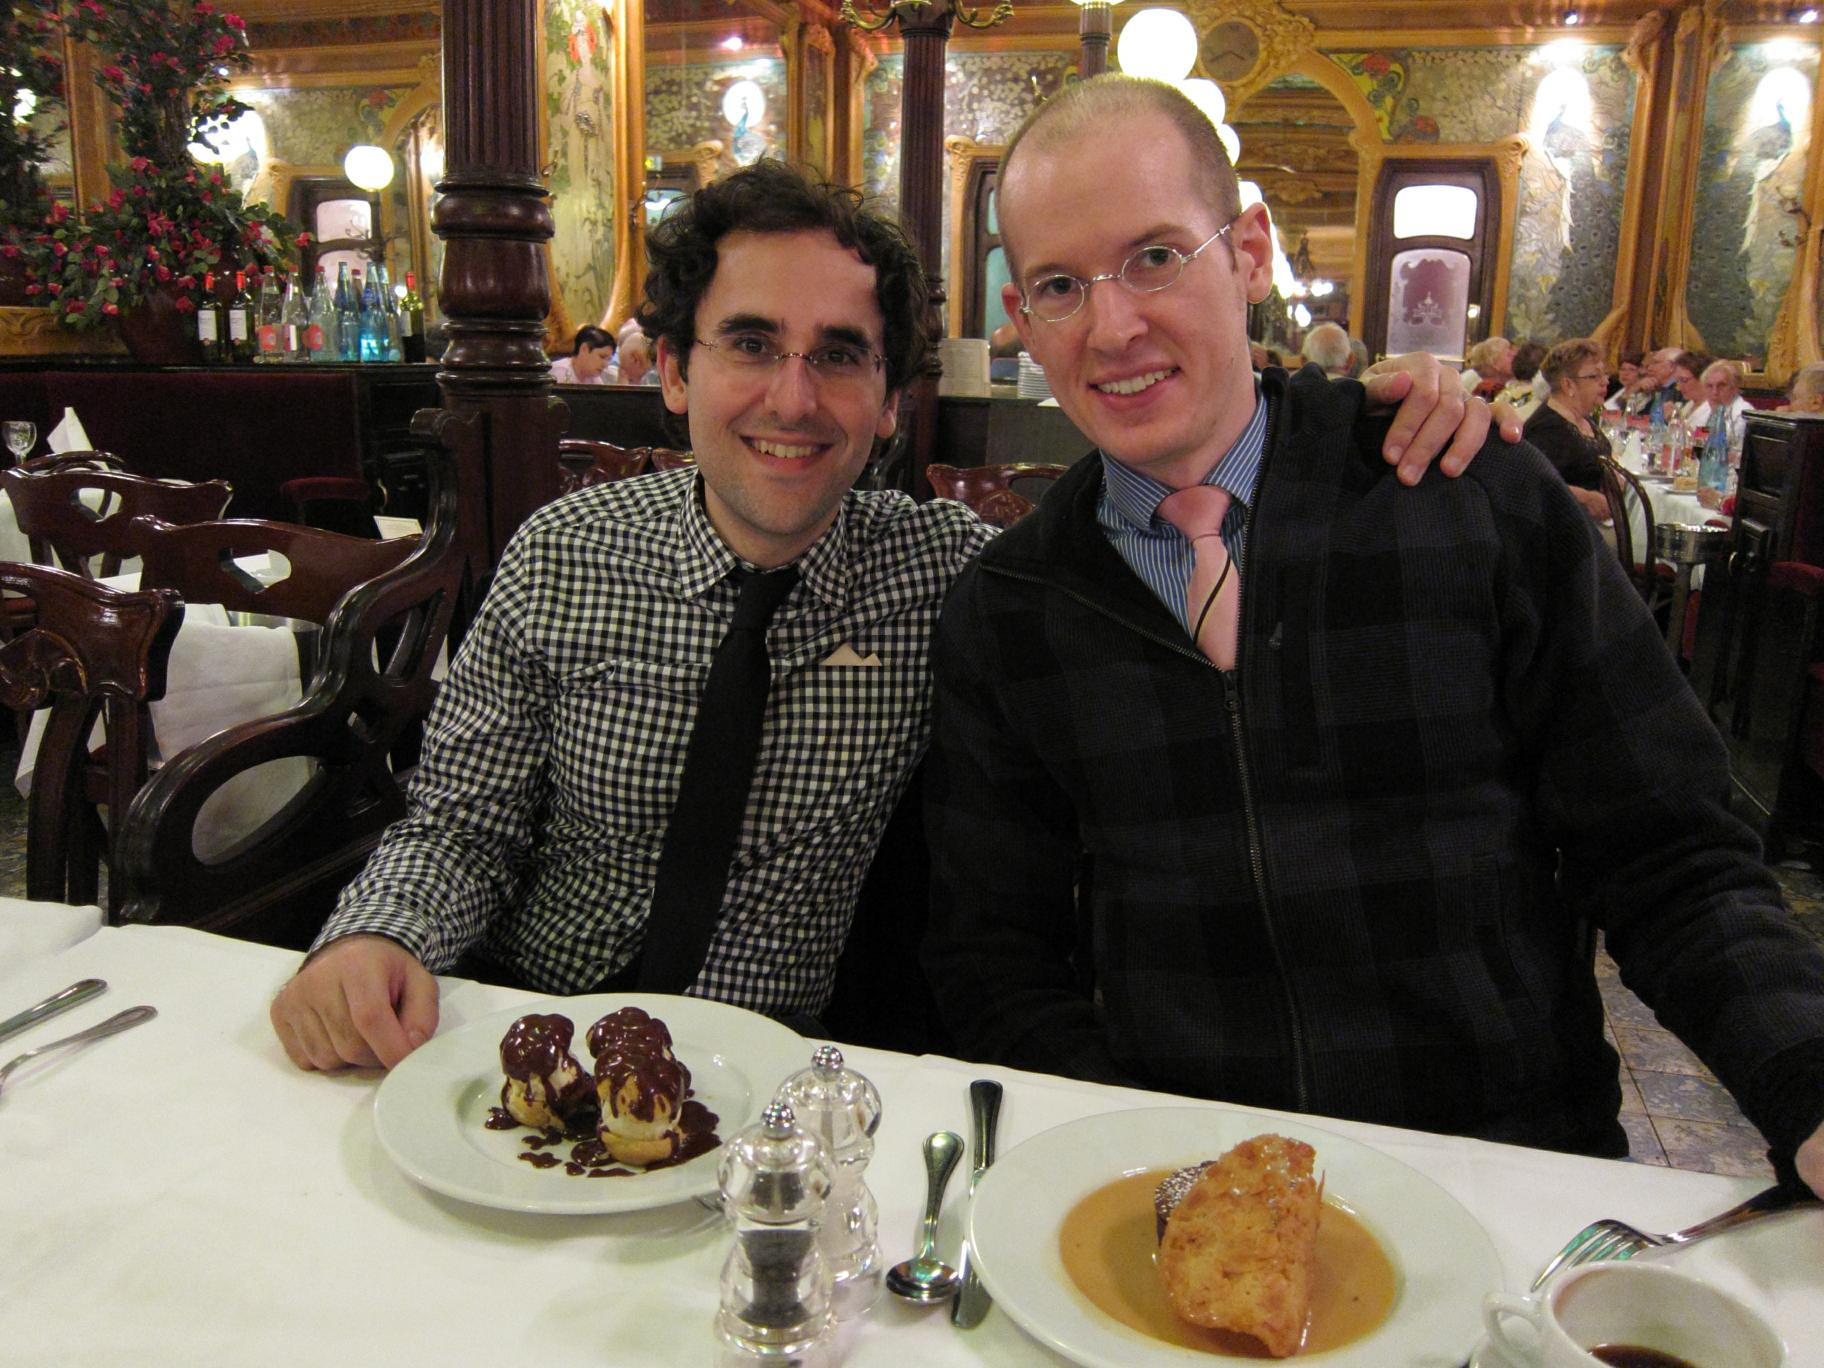 Alan and Ryan at Brasserie Julien